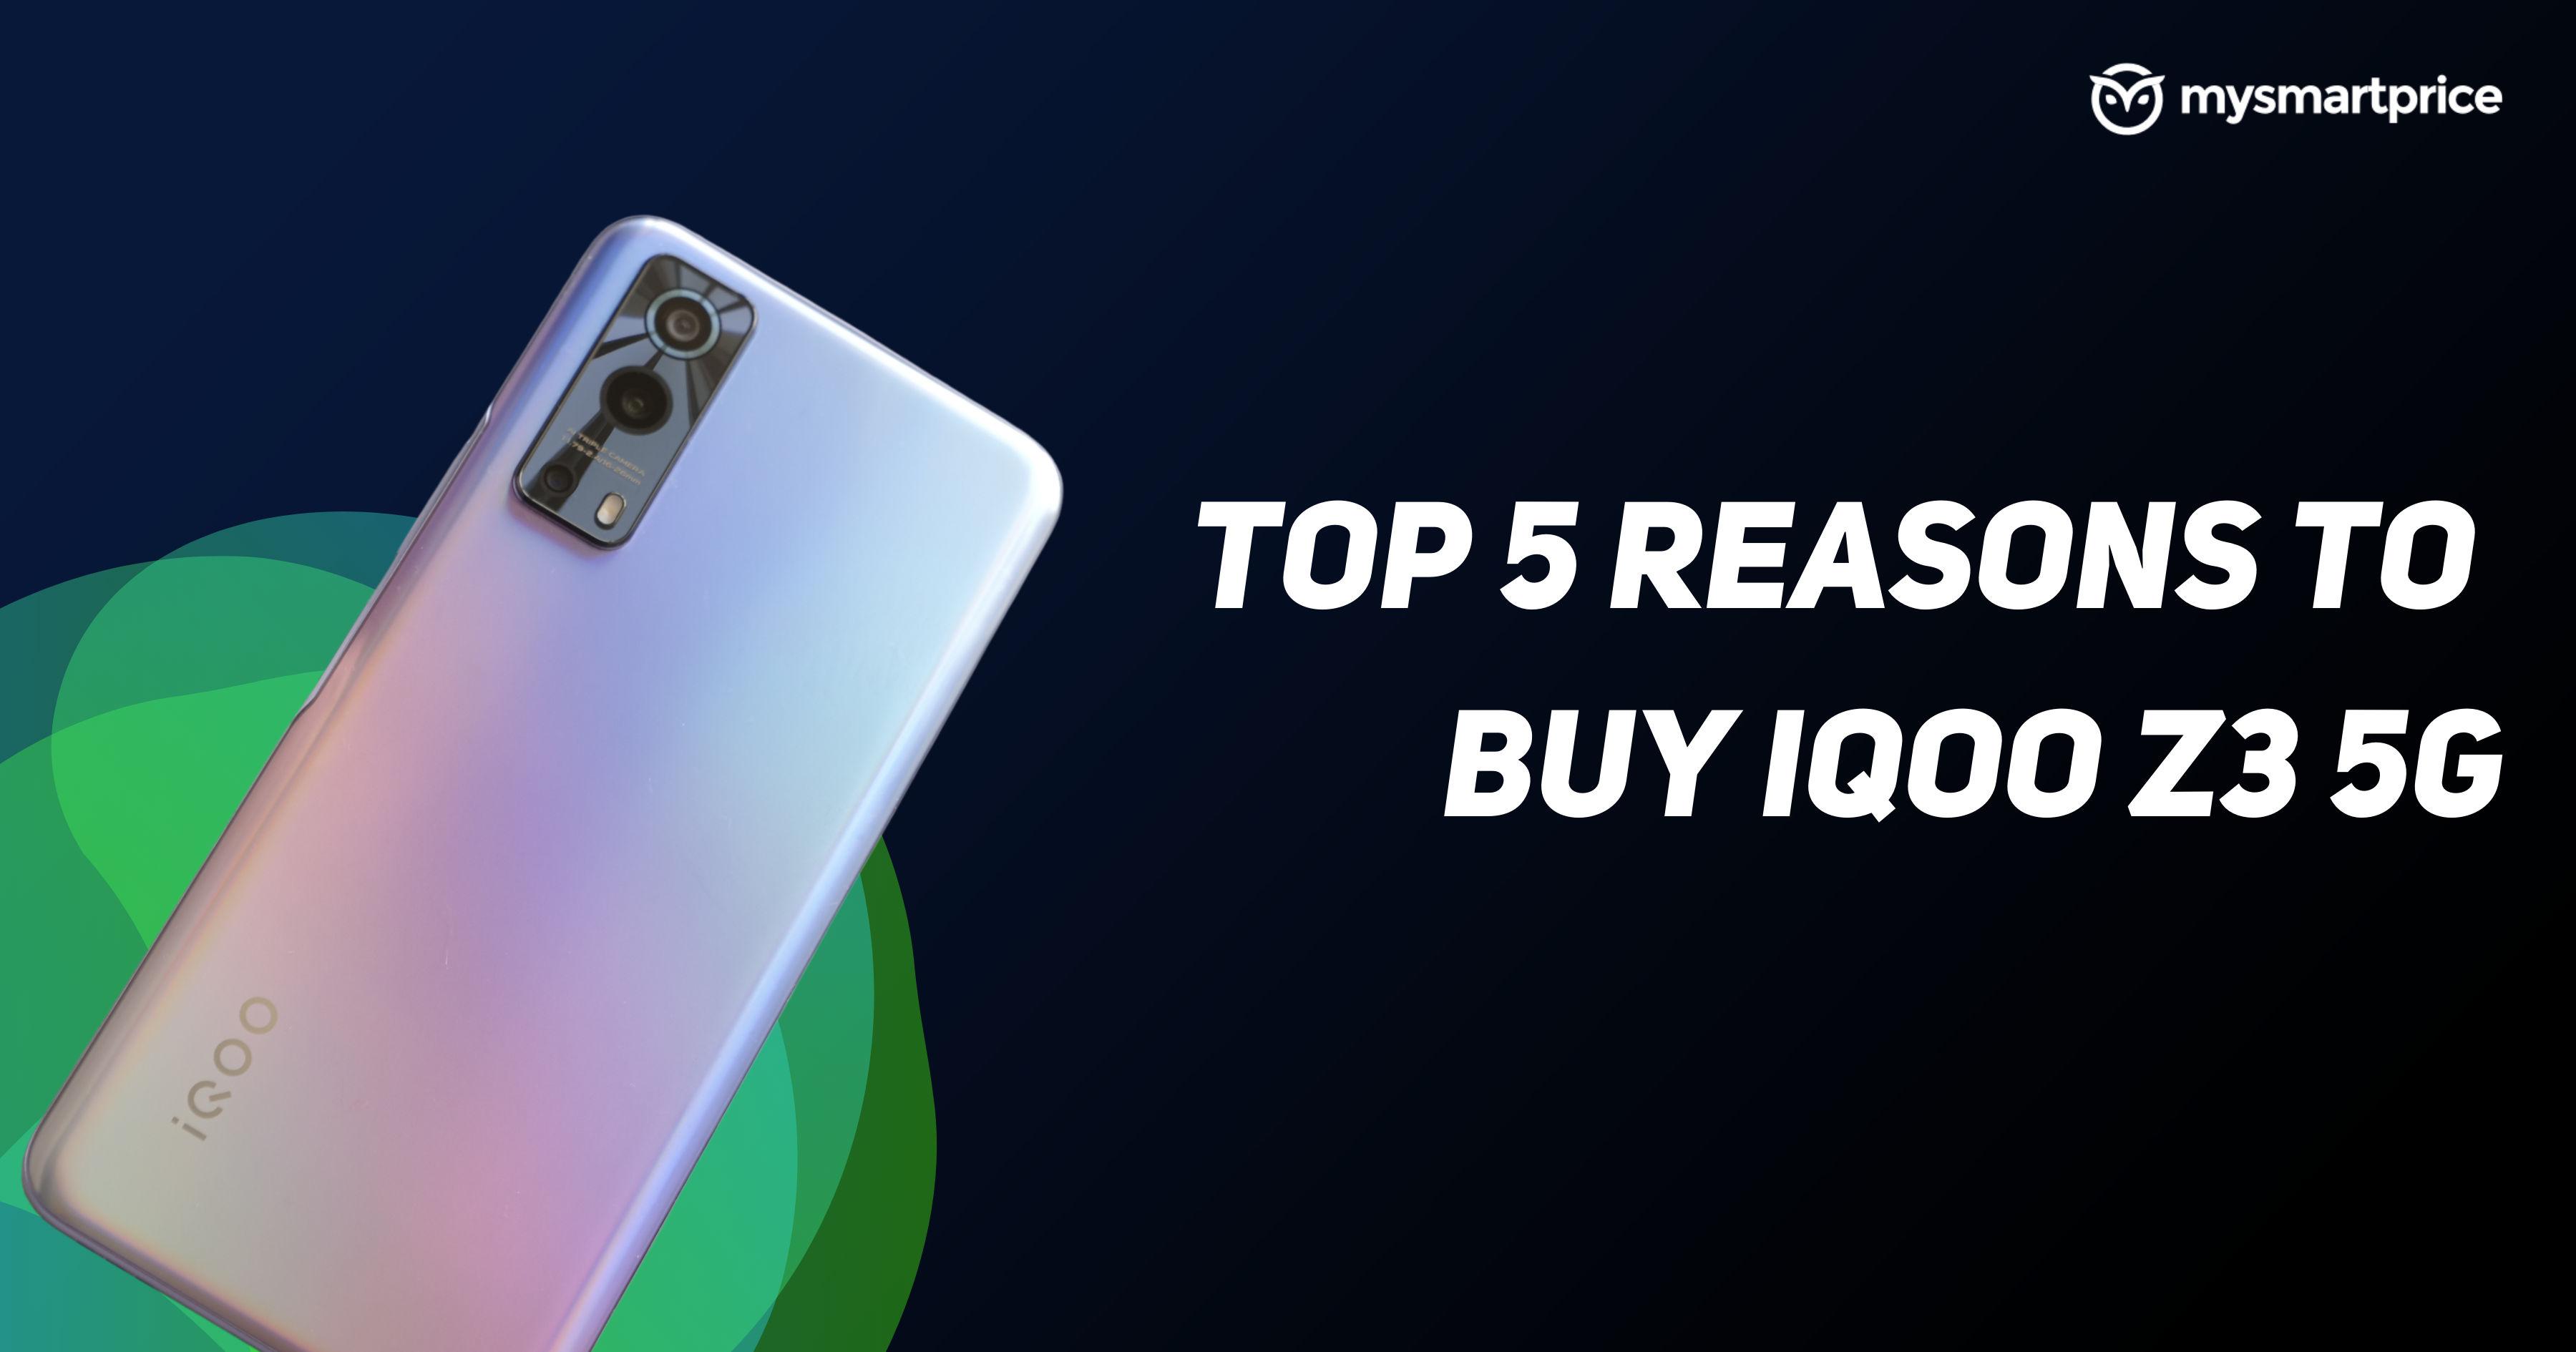 Top 5 Reasons to Buy iQOO Z3 5G